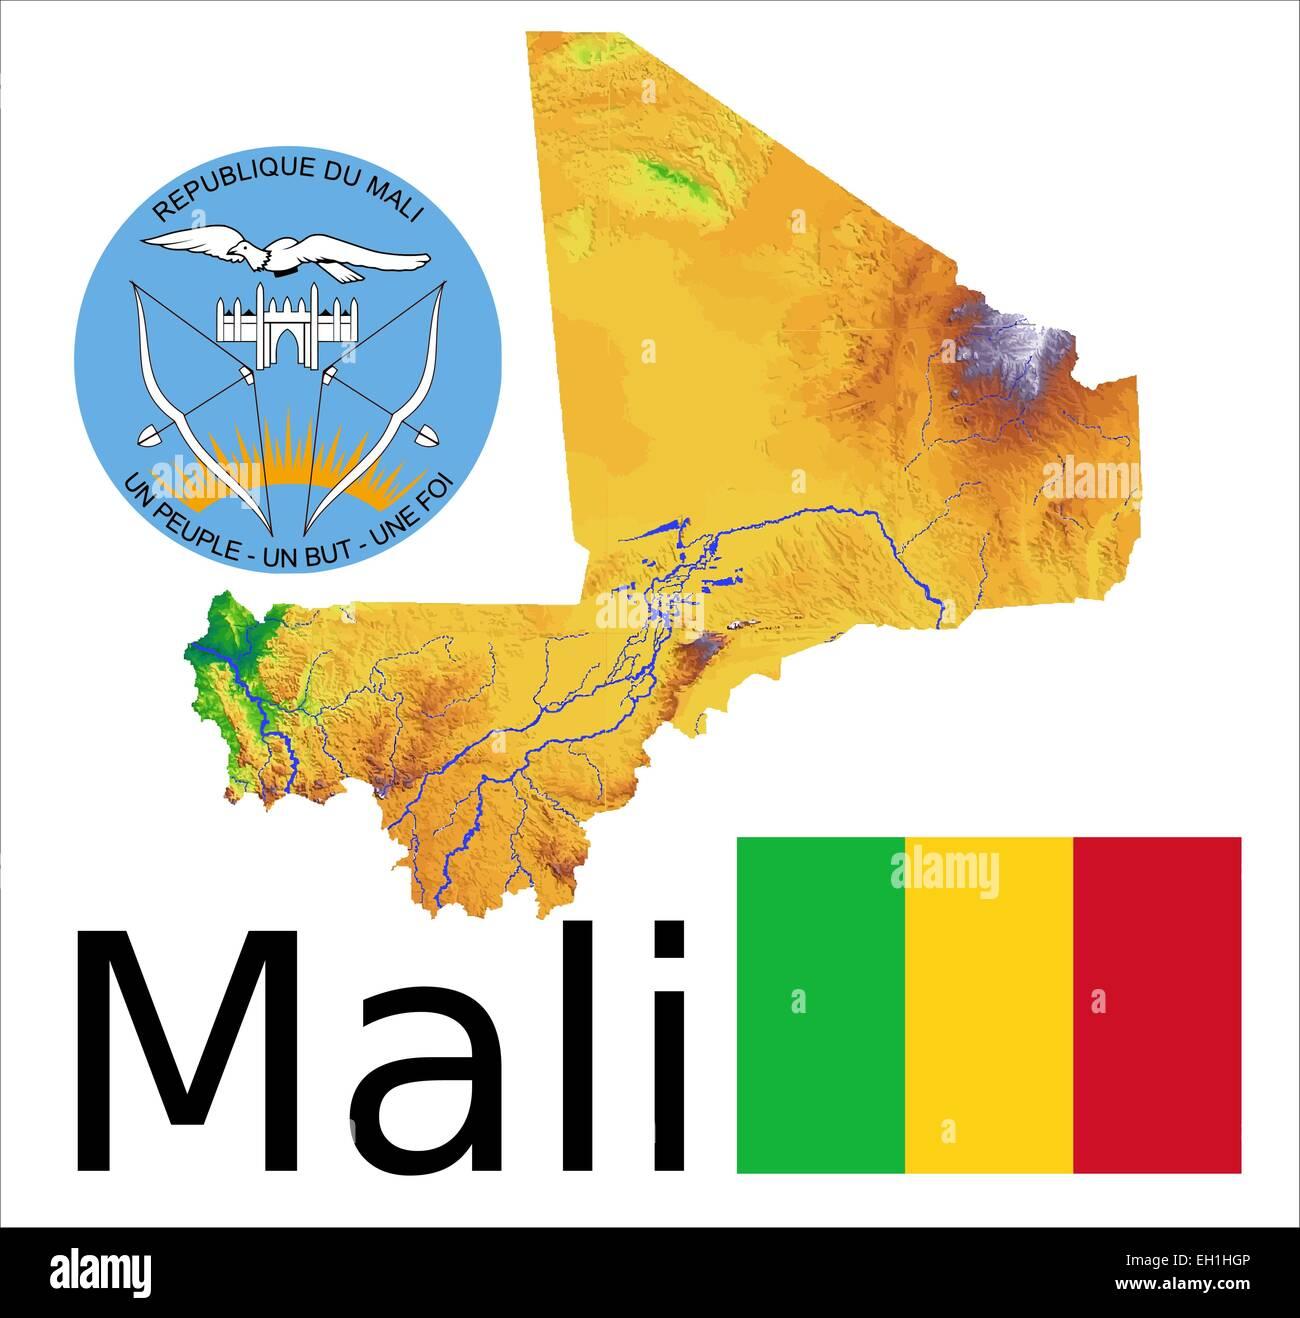 Mali map flag coat Stock Vector Art & Illustration, Vector Image ...